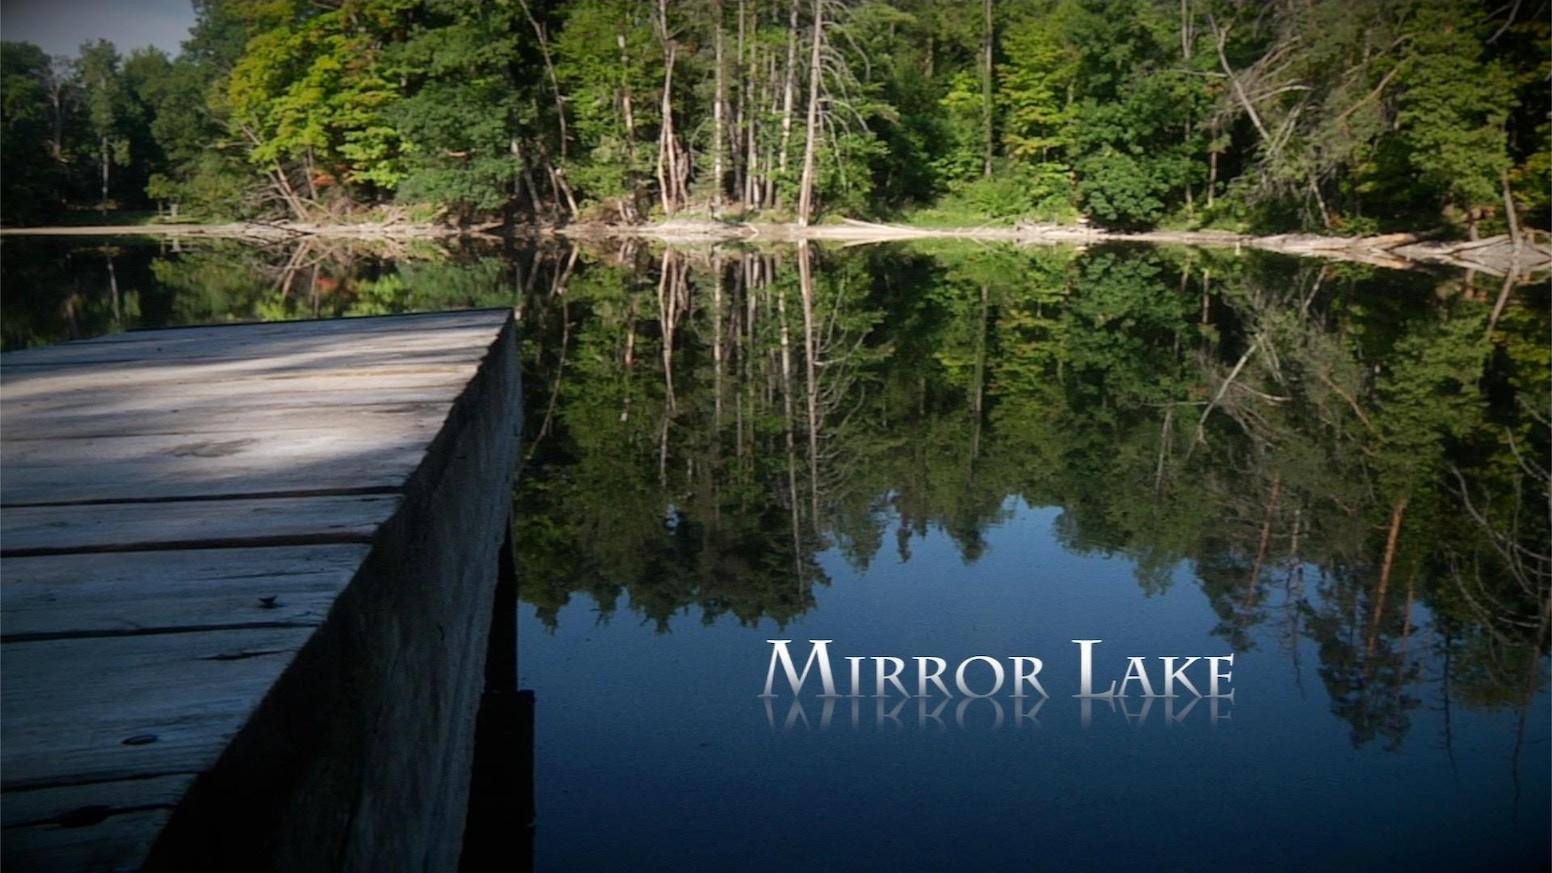 Mirror Lake - Indie Suspense / Horror Short by Lemon Fresh